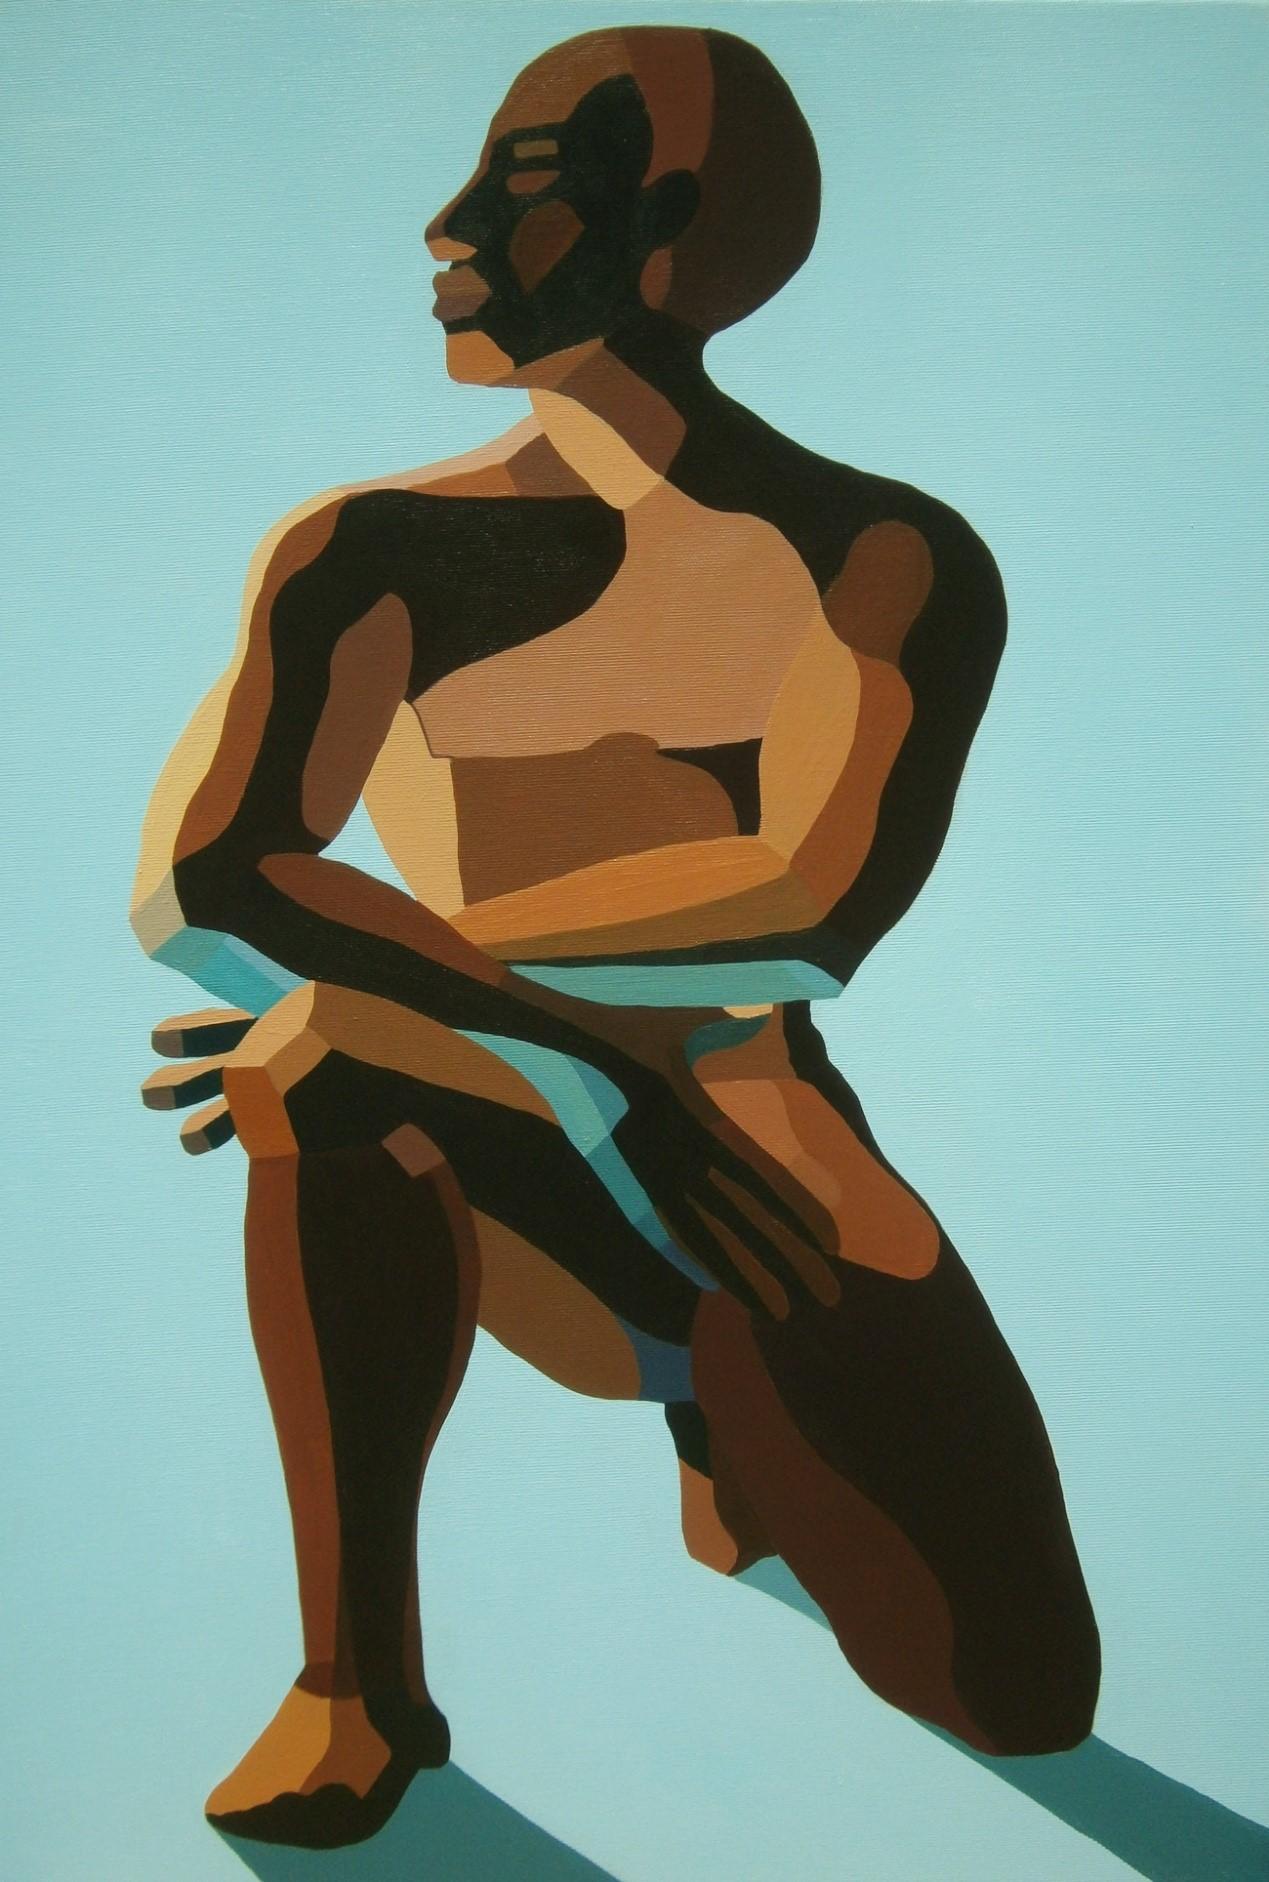 Nirit Takele, Justice for Yosef Salamsa, 75x55 cm, acrylic on canvas, 2016